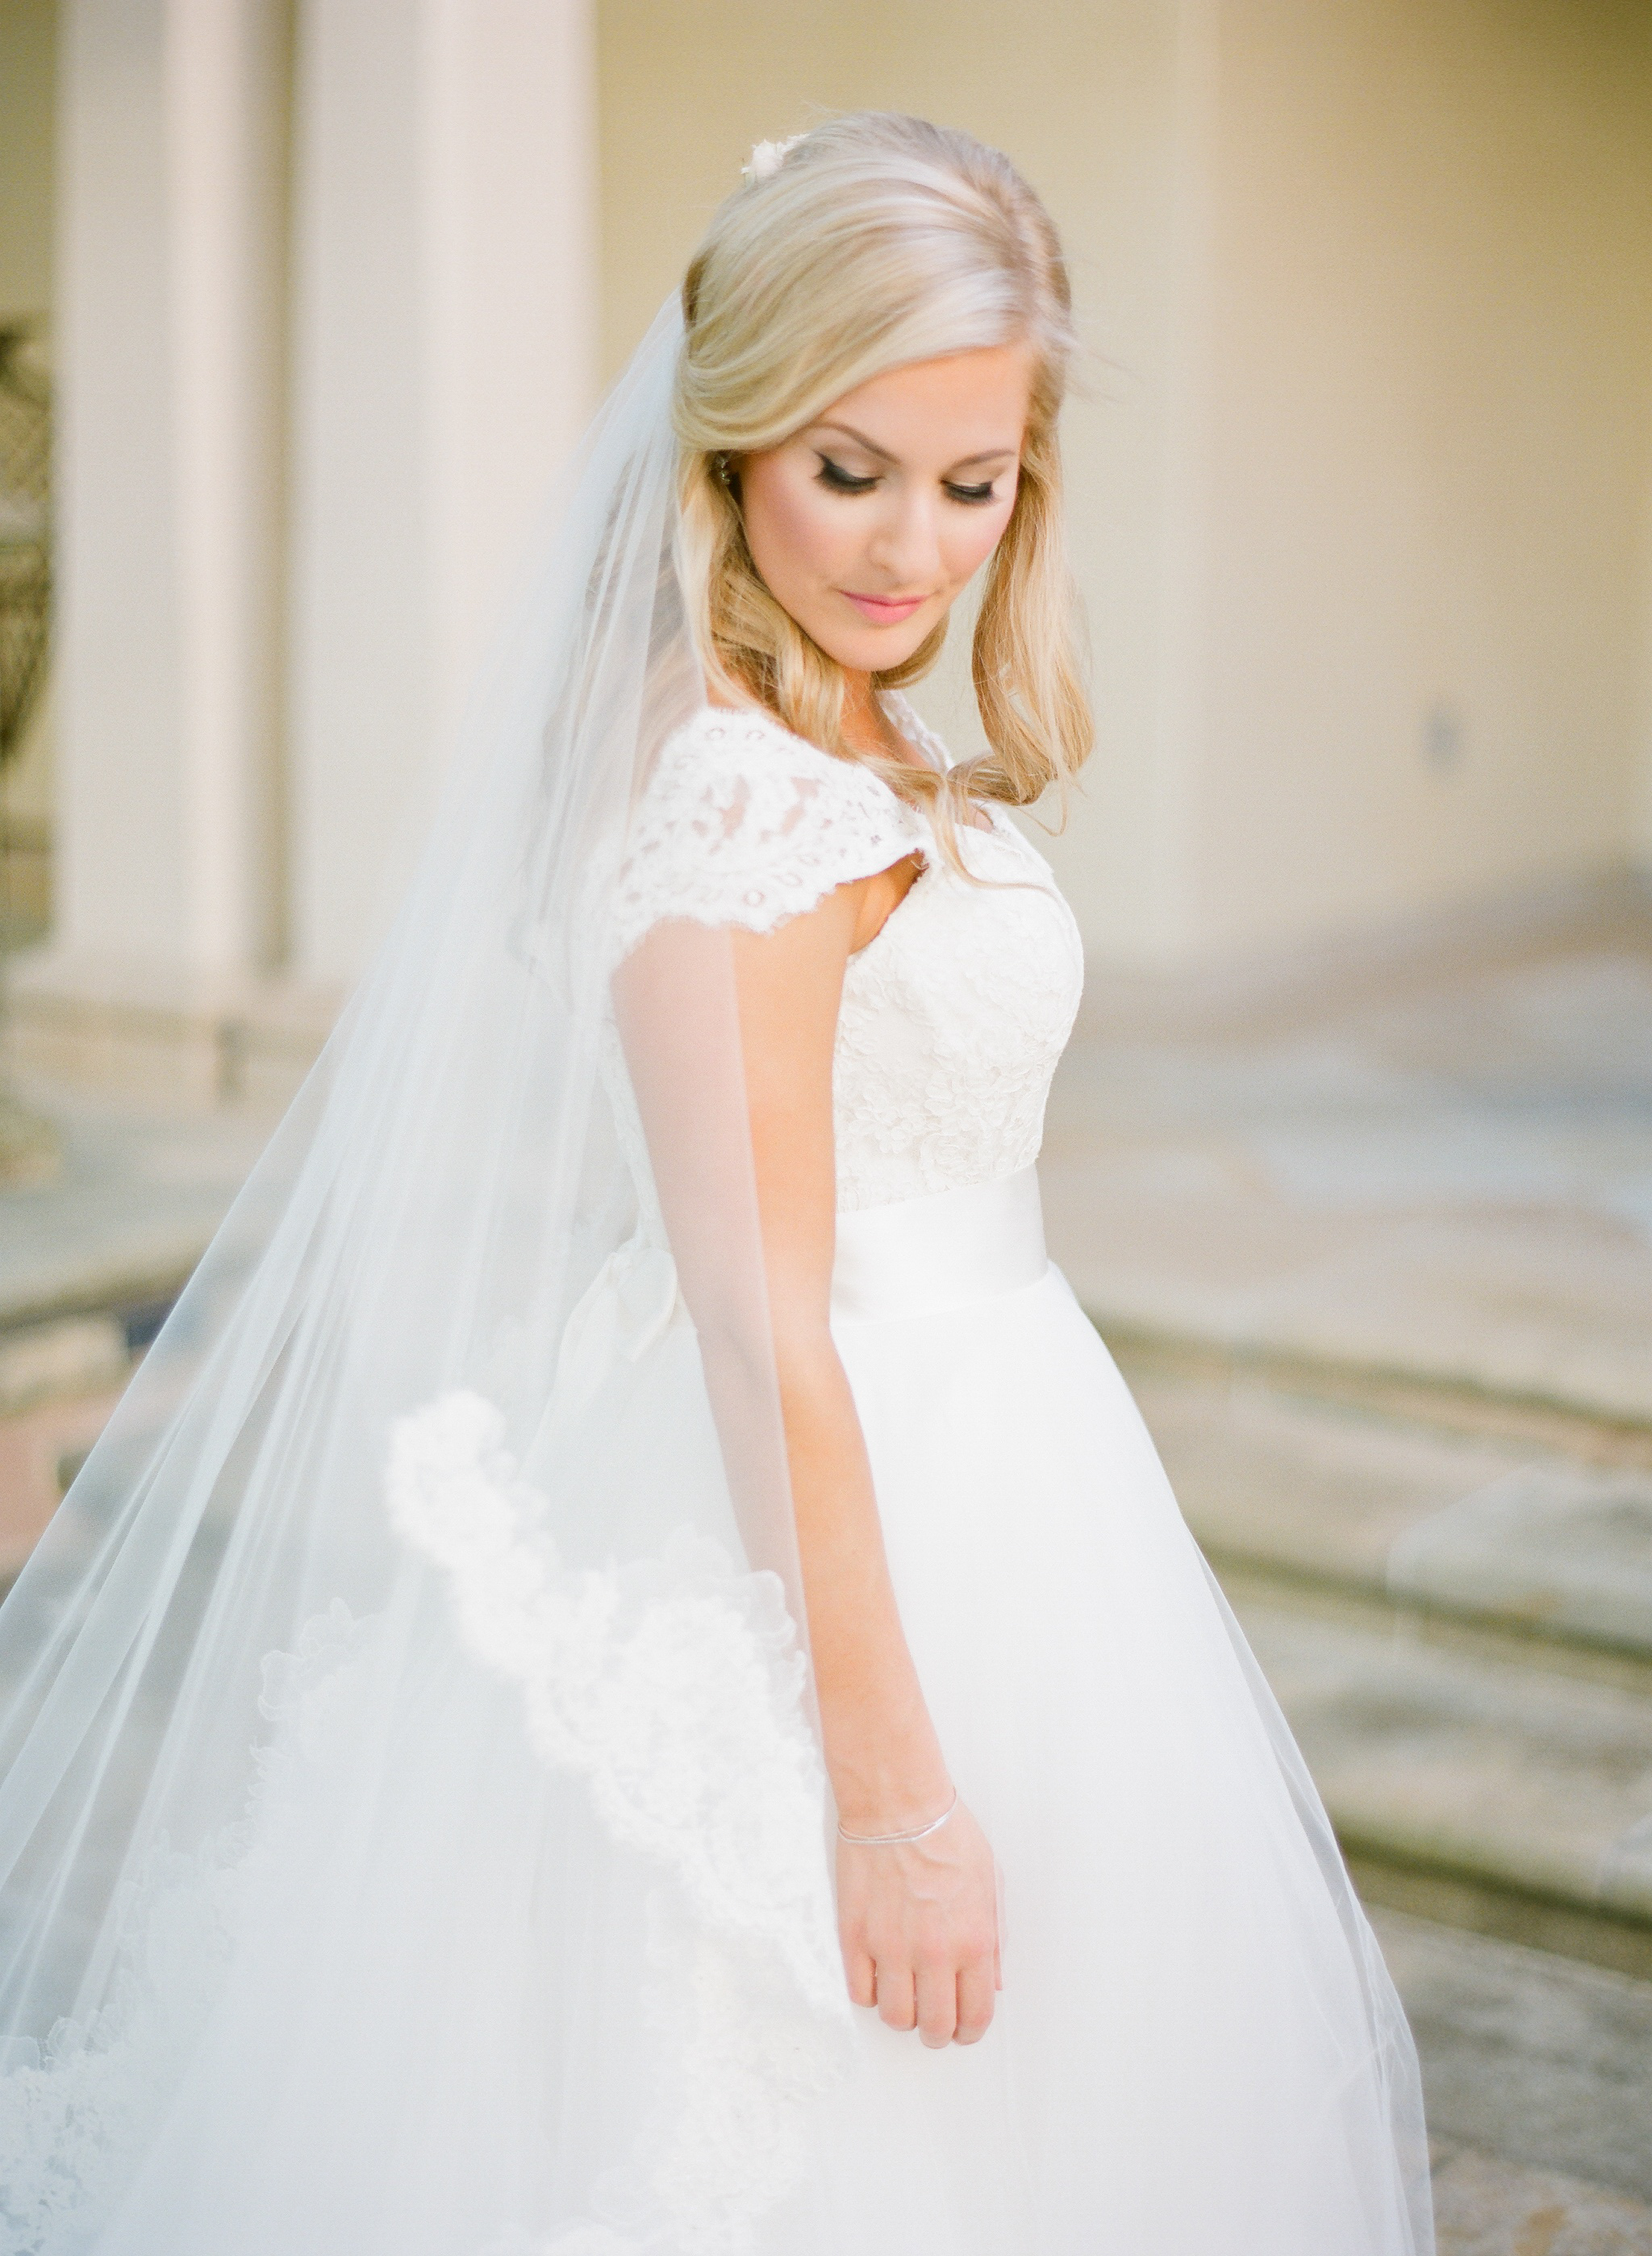 Ceci_New_York_Florida_Wedding_Style_Bride_Watercolor_Real_Custom_Luxury_53.jpg